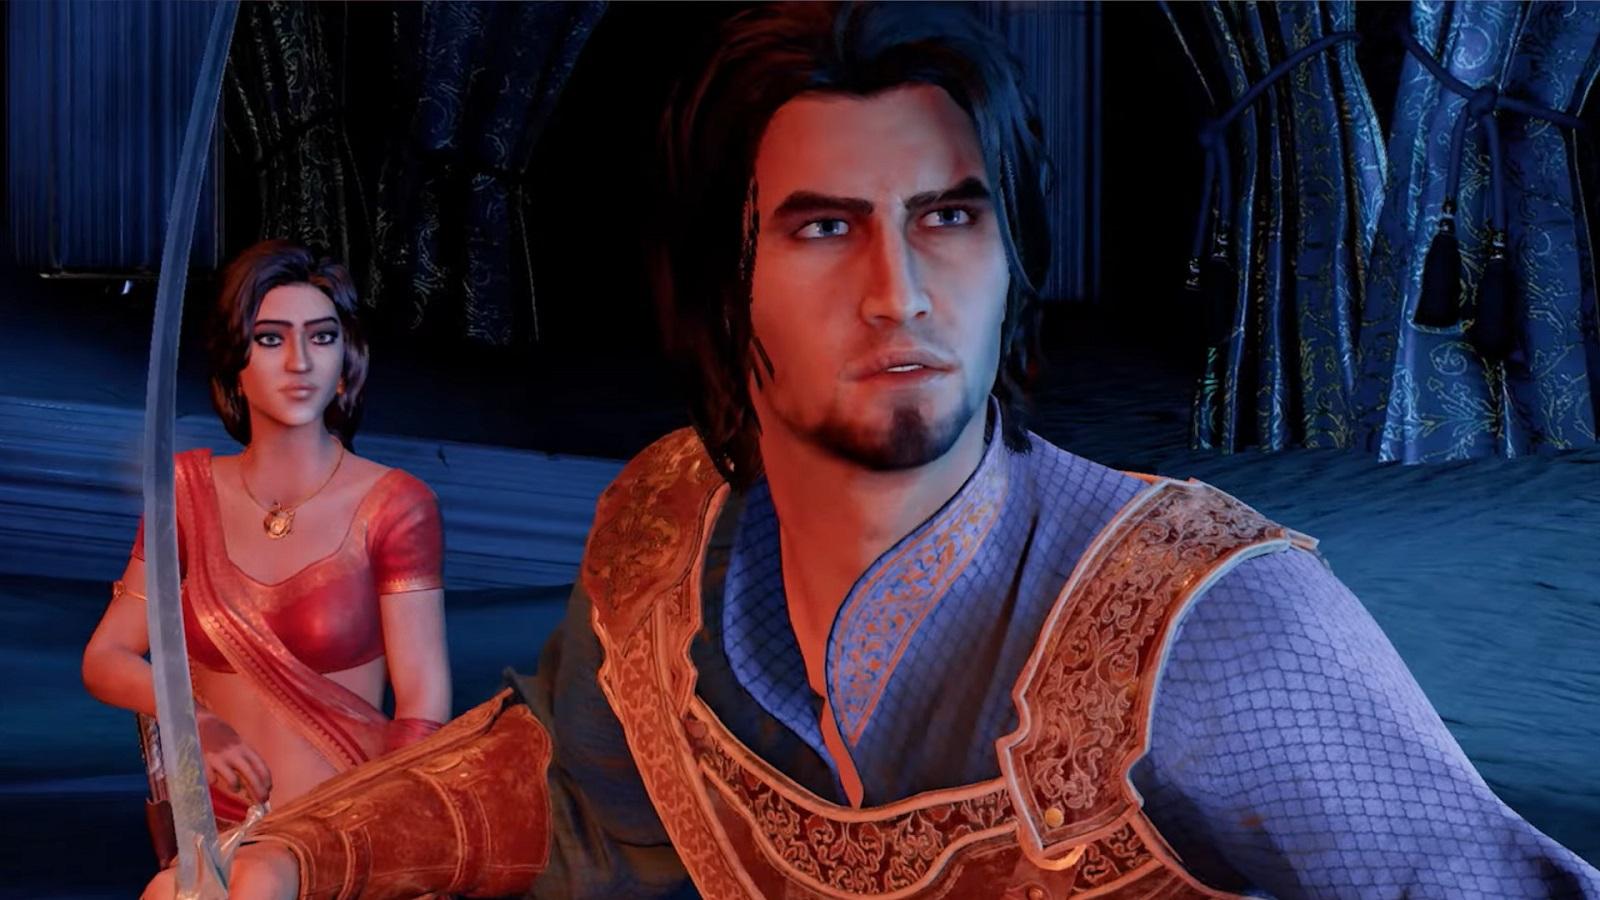 В цифровом магазине Ubisoft заметили Switch-версию ремейка Prince of Persia: The Sands of Time